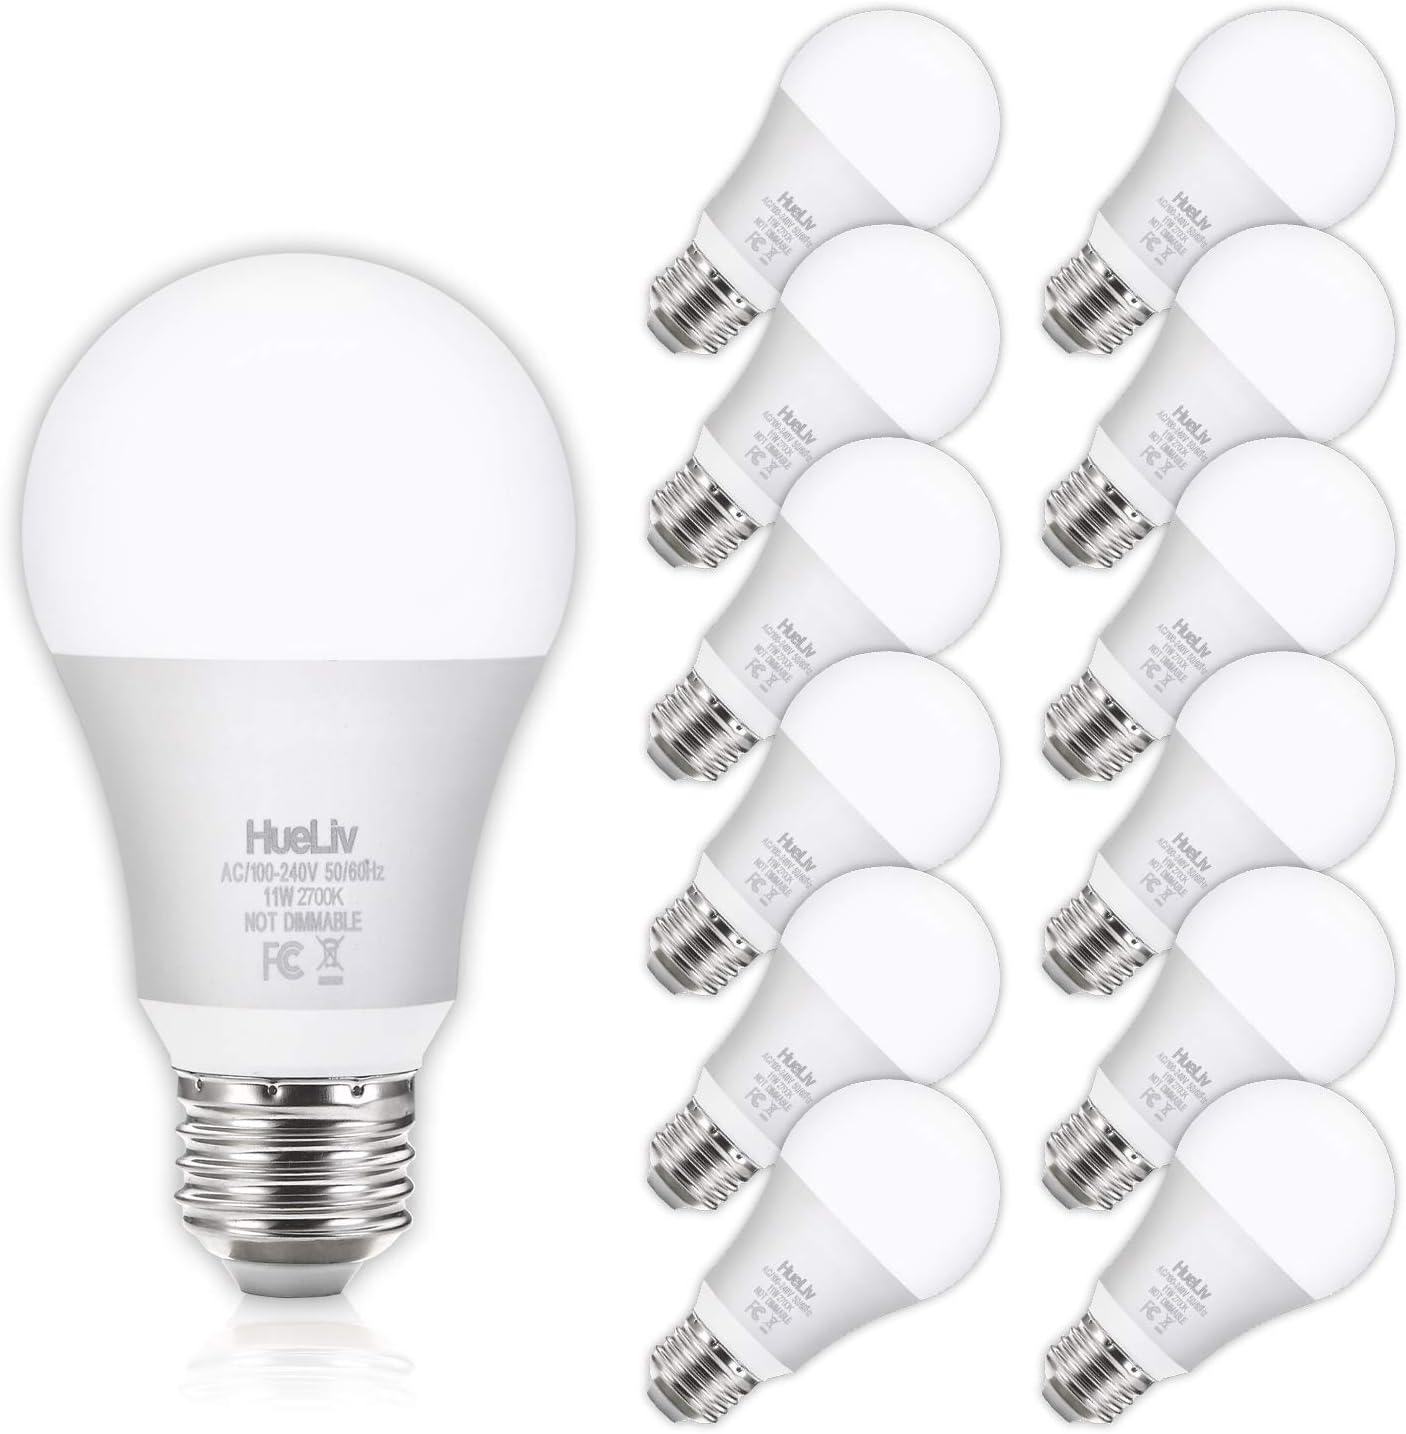 12Pack A19 LED Light Bulbs, 100 Watt Equivalent LED Bulbs, 2700K Warm White, No Flicker E26 Edison Medium Screw Base Bulbs, 1100Lumens, Non Dimmable